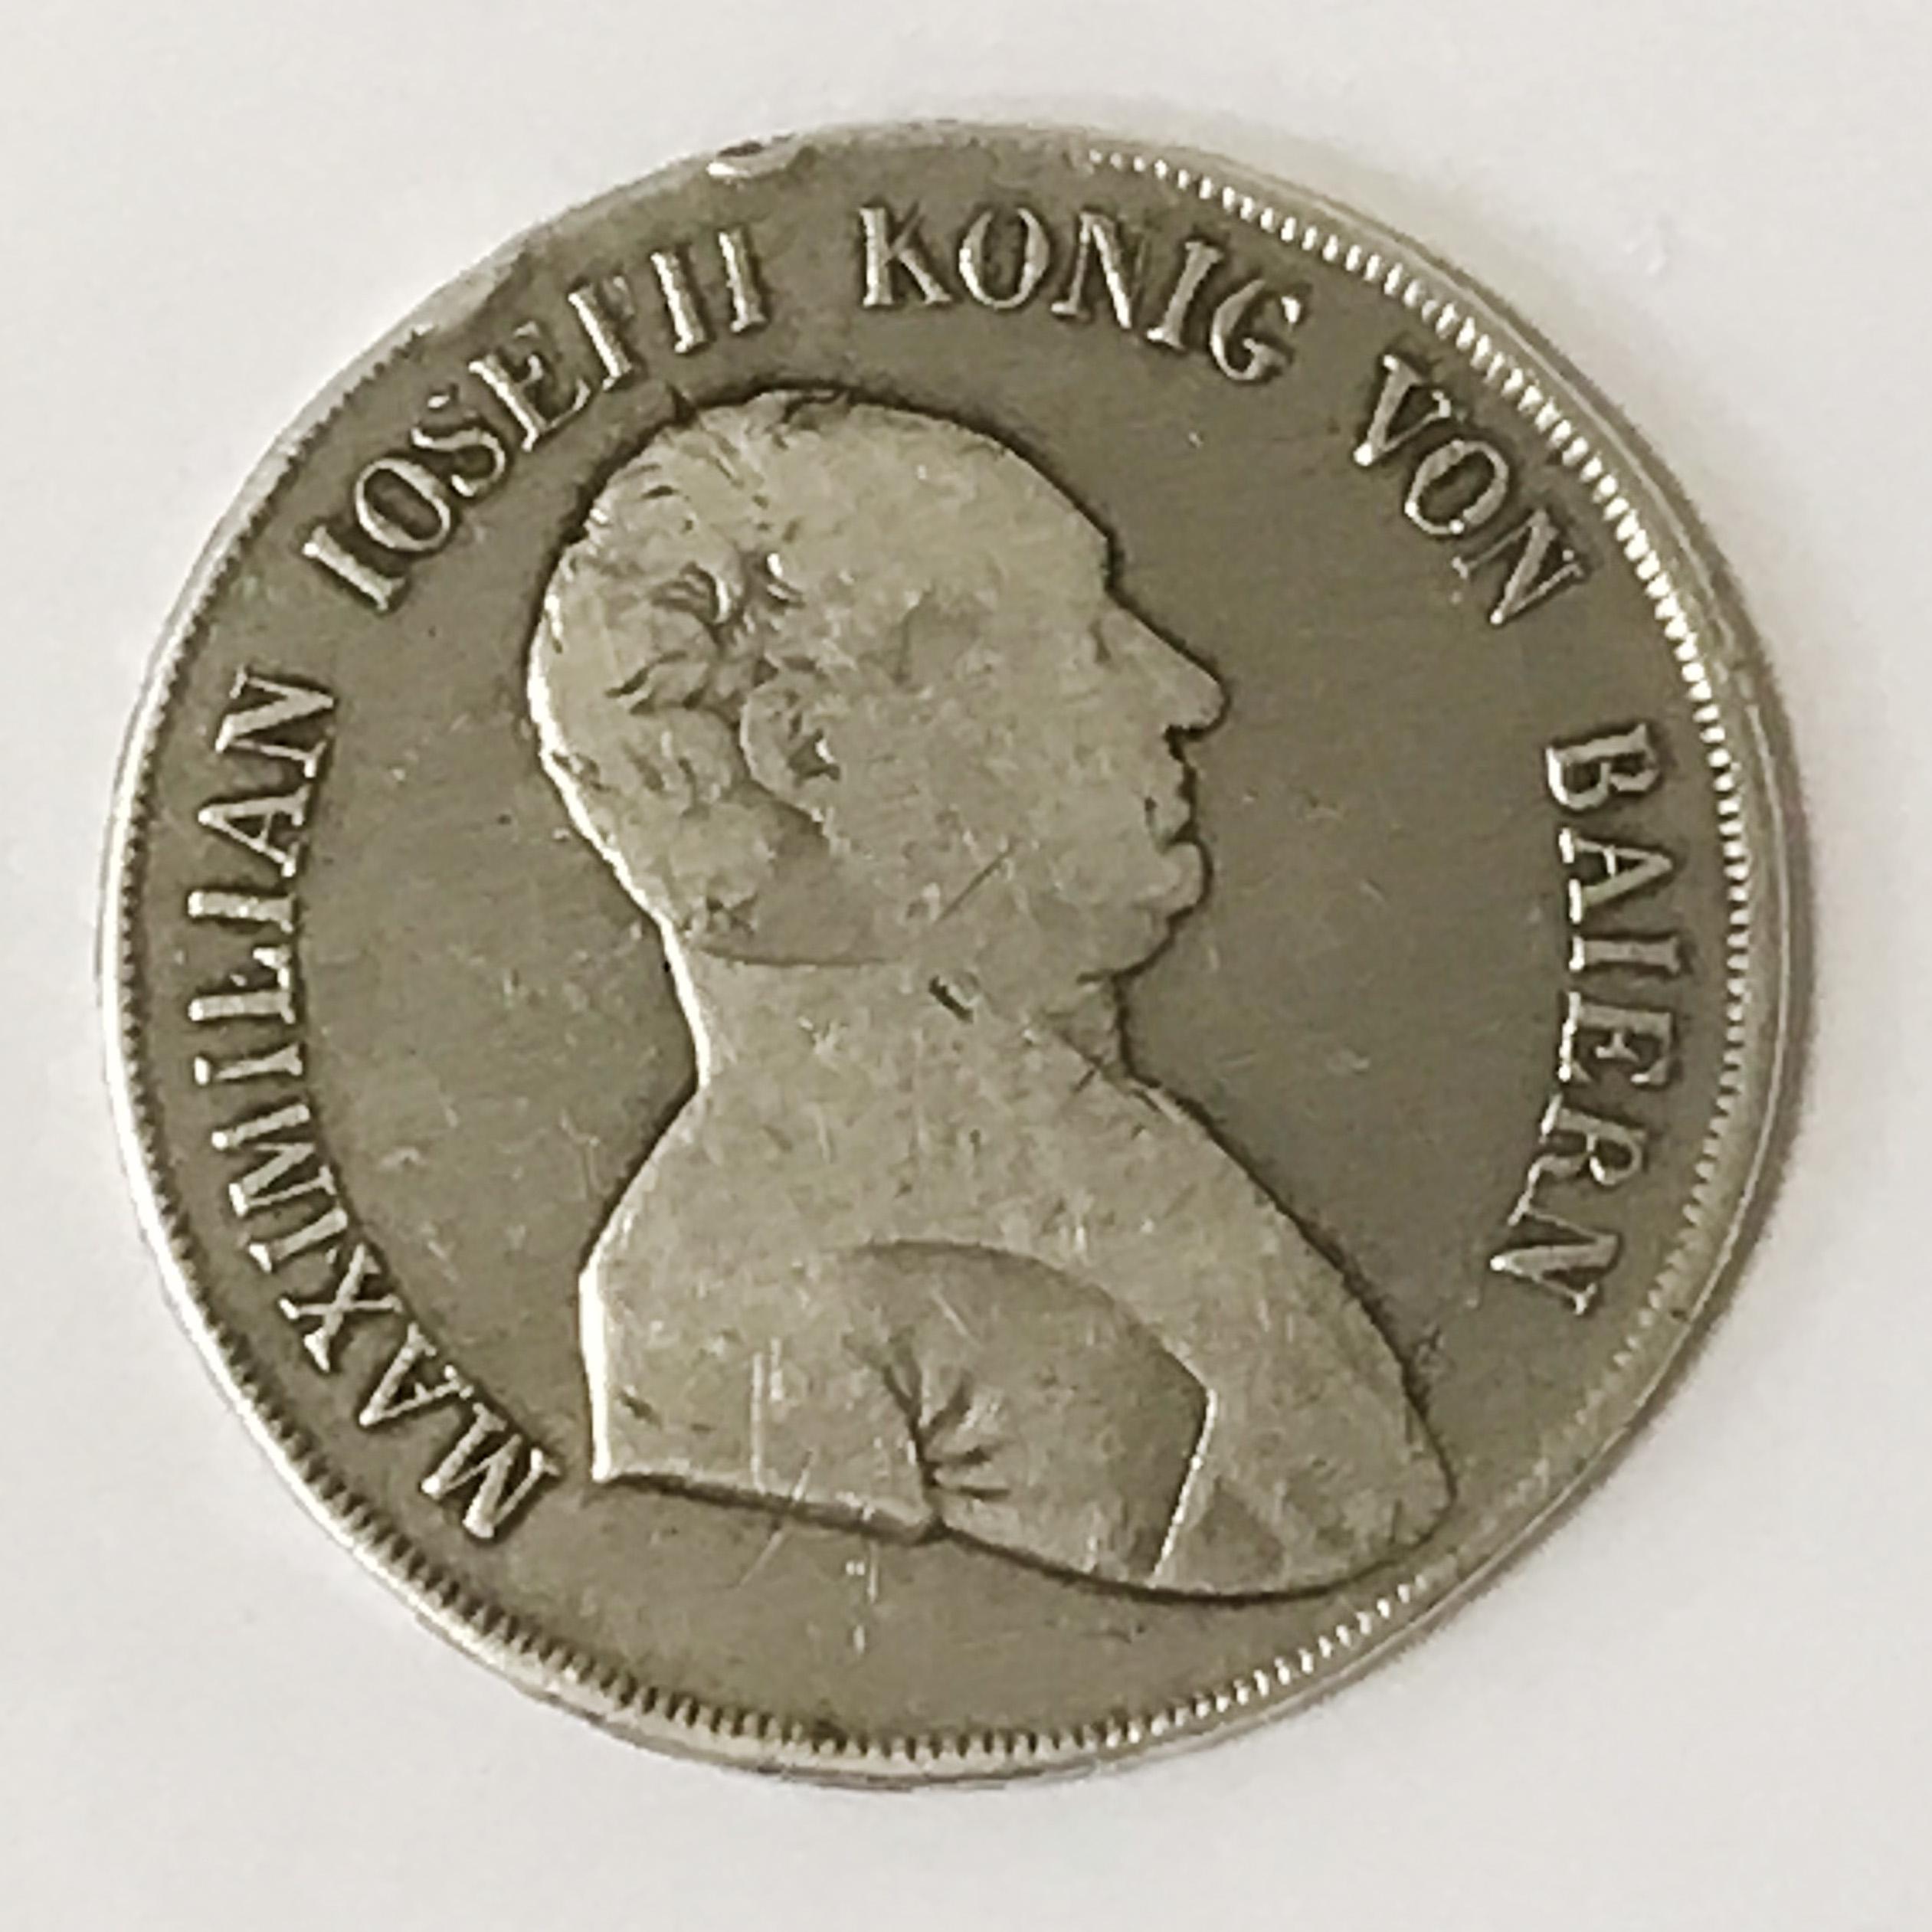 GERMAN SILVER COIN 1808